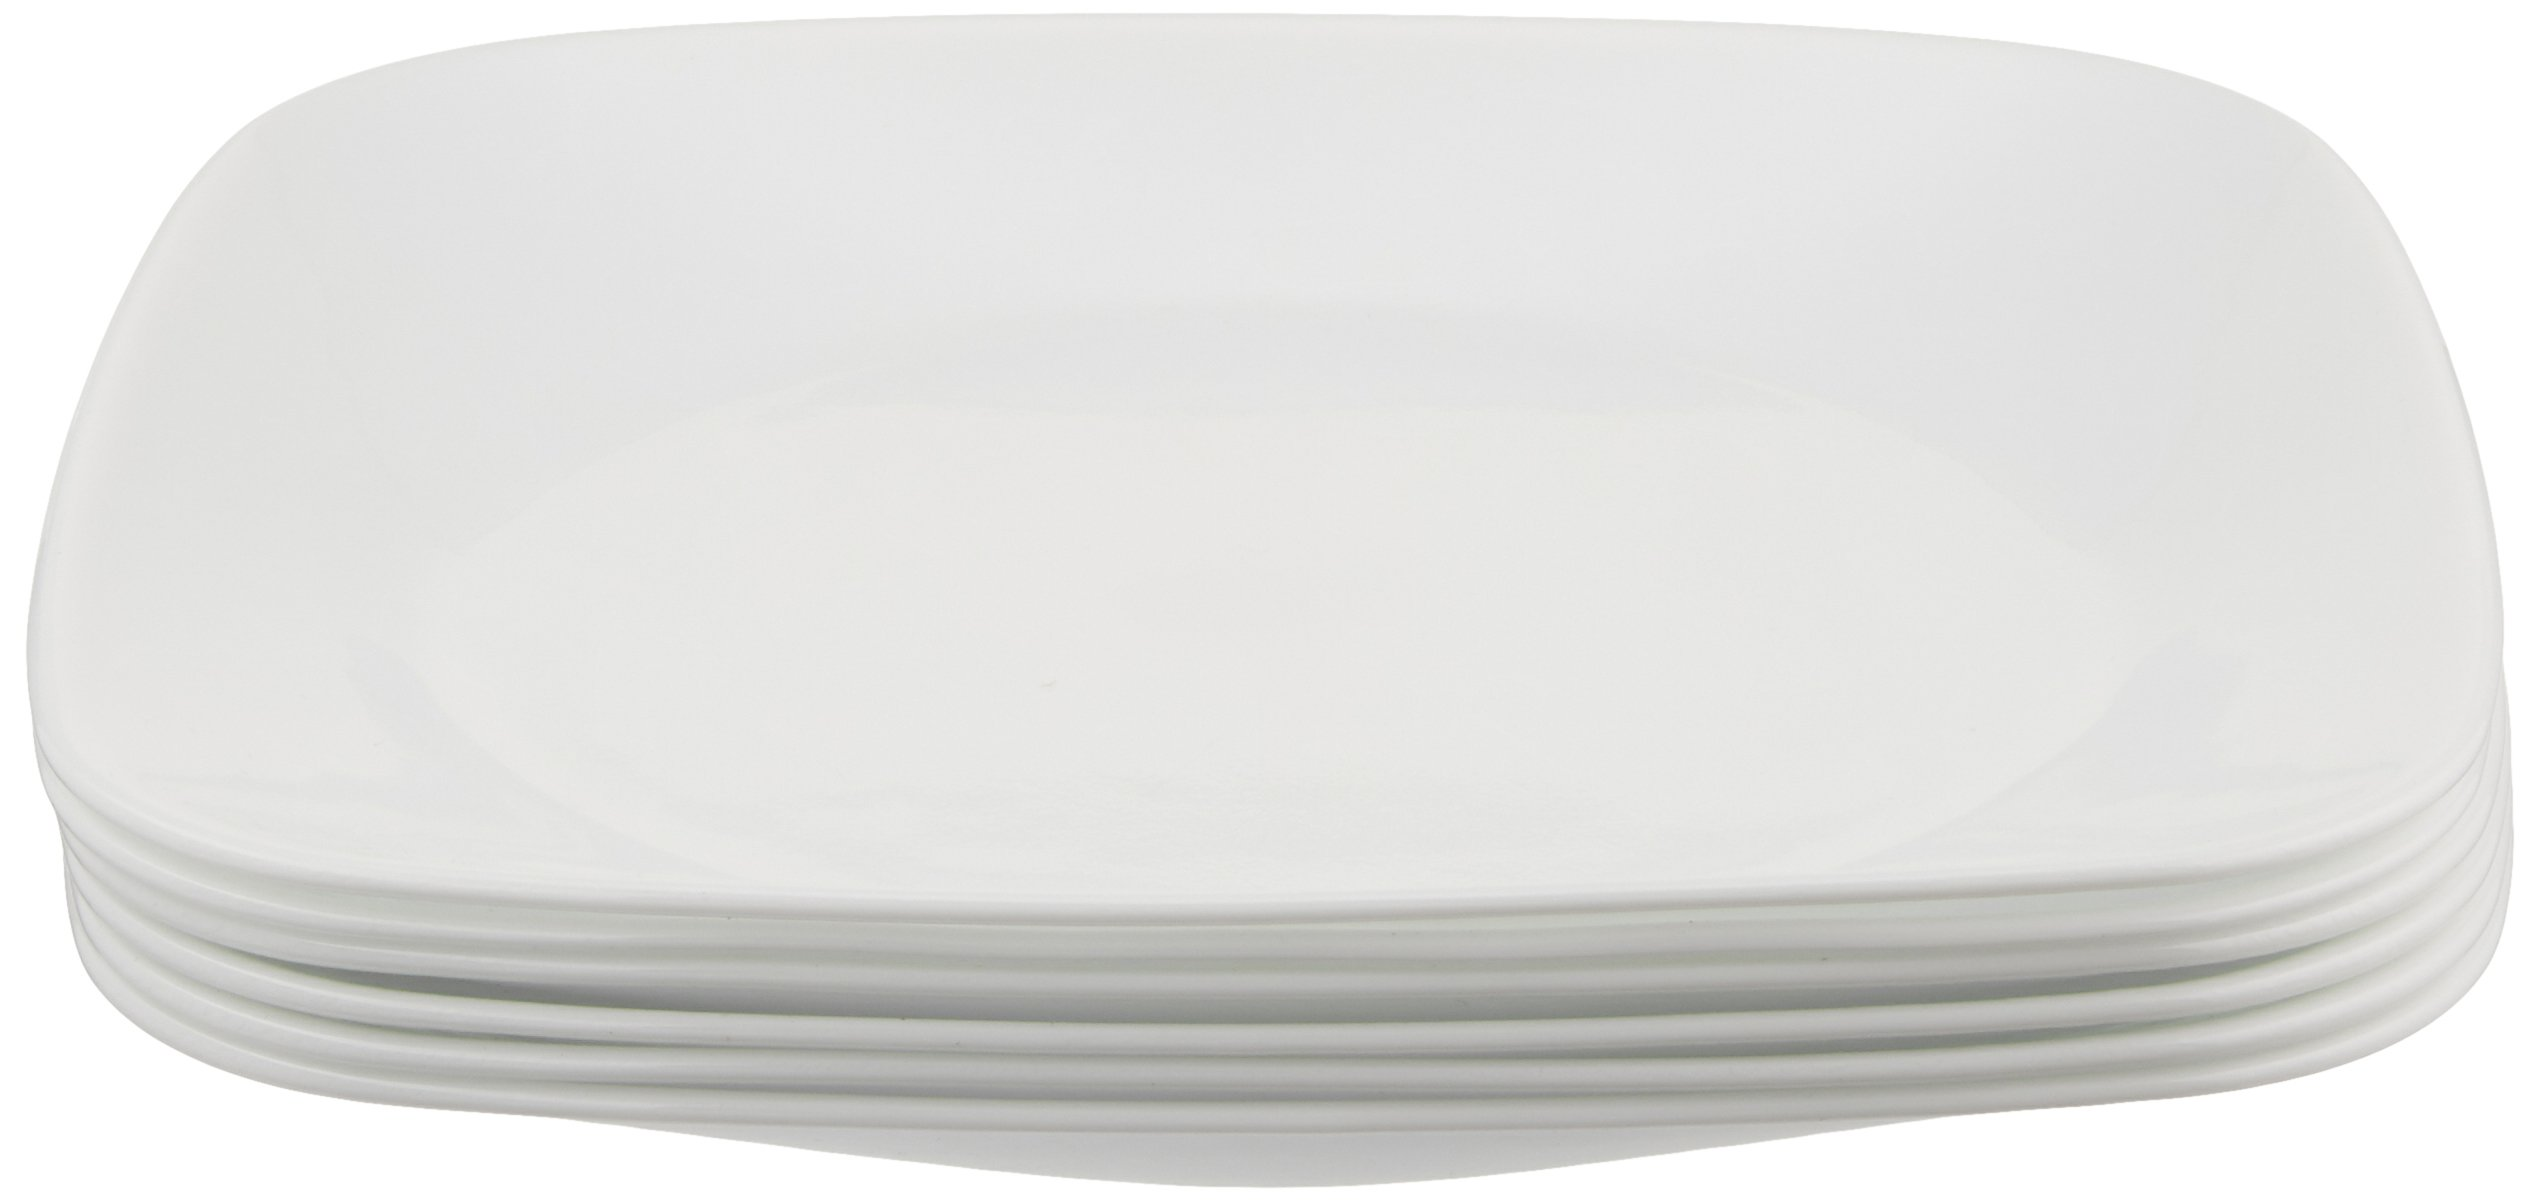 Corelle Square Pure White 9-Inch Plate Set (6-Piece) by Corelle